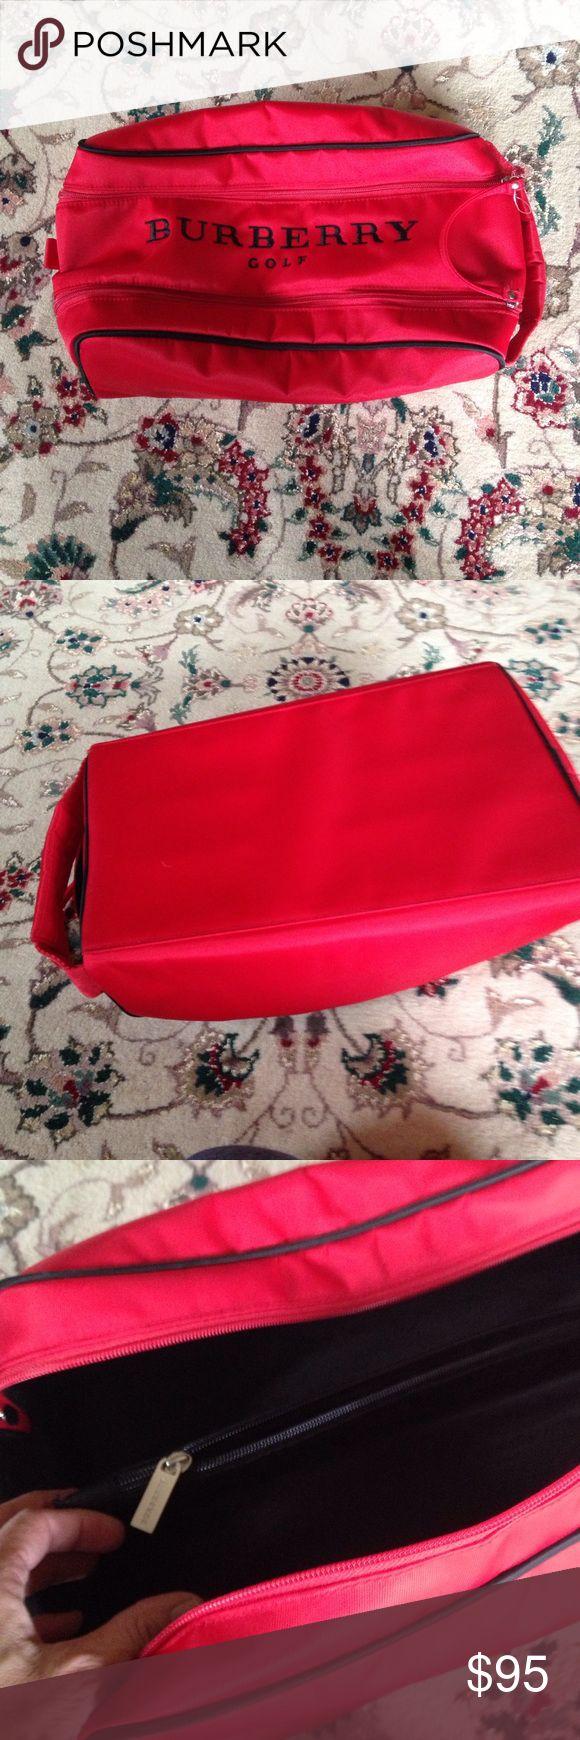 Burberry golf shoe bag Red Burberry gold bag. Burberry Bags Travel Bags